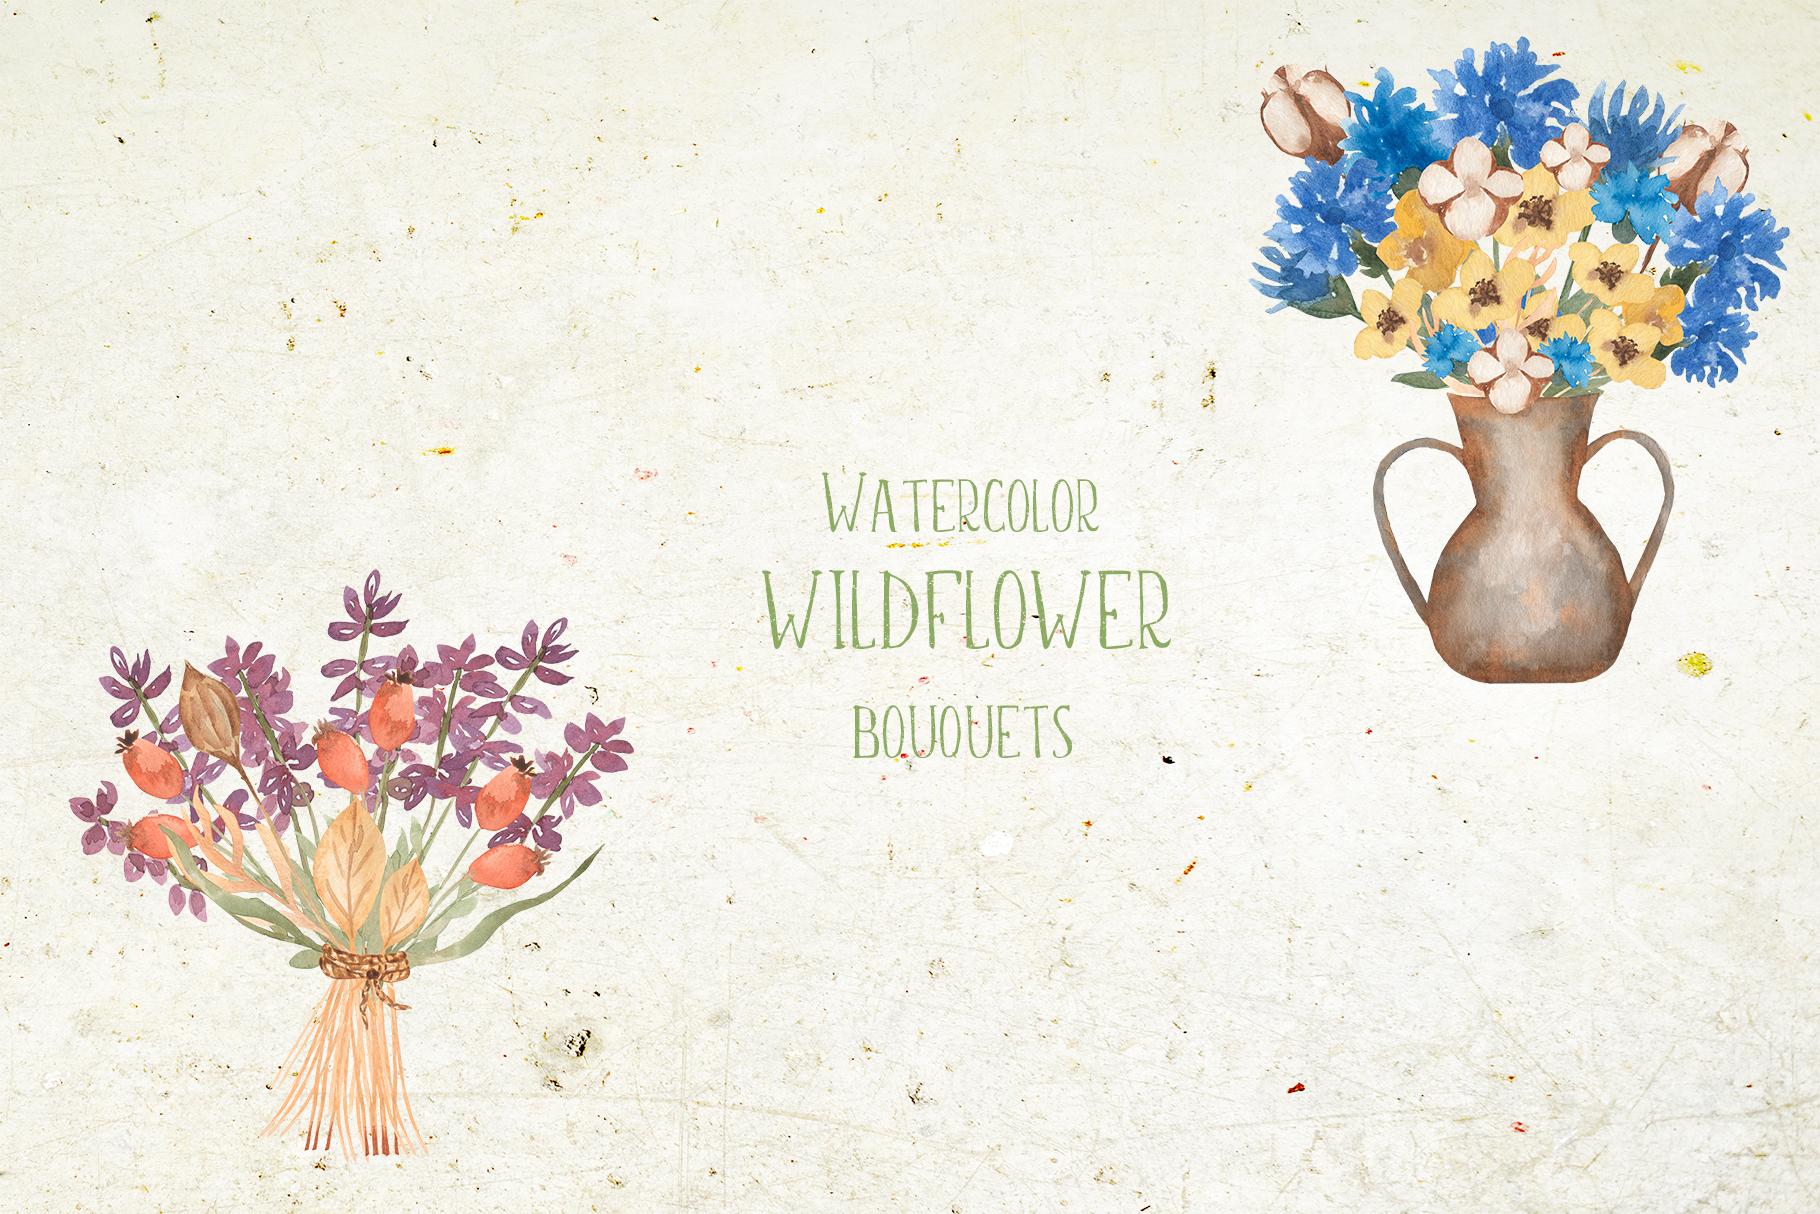 Wildflowers example image 1